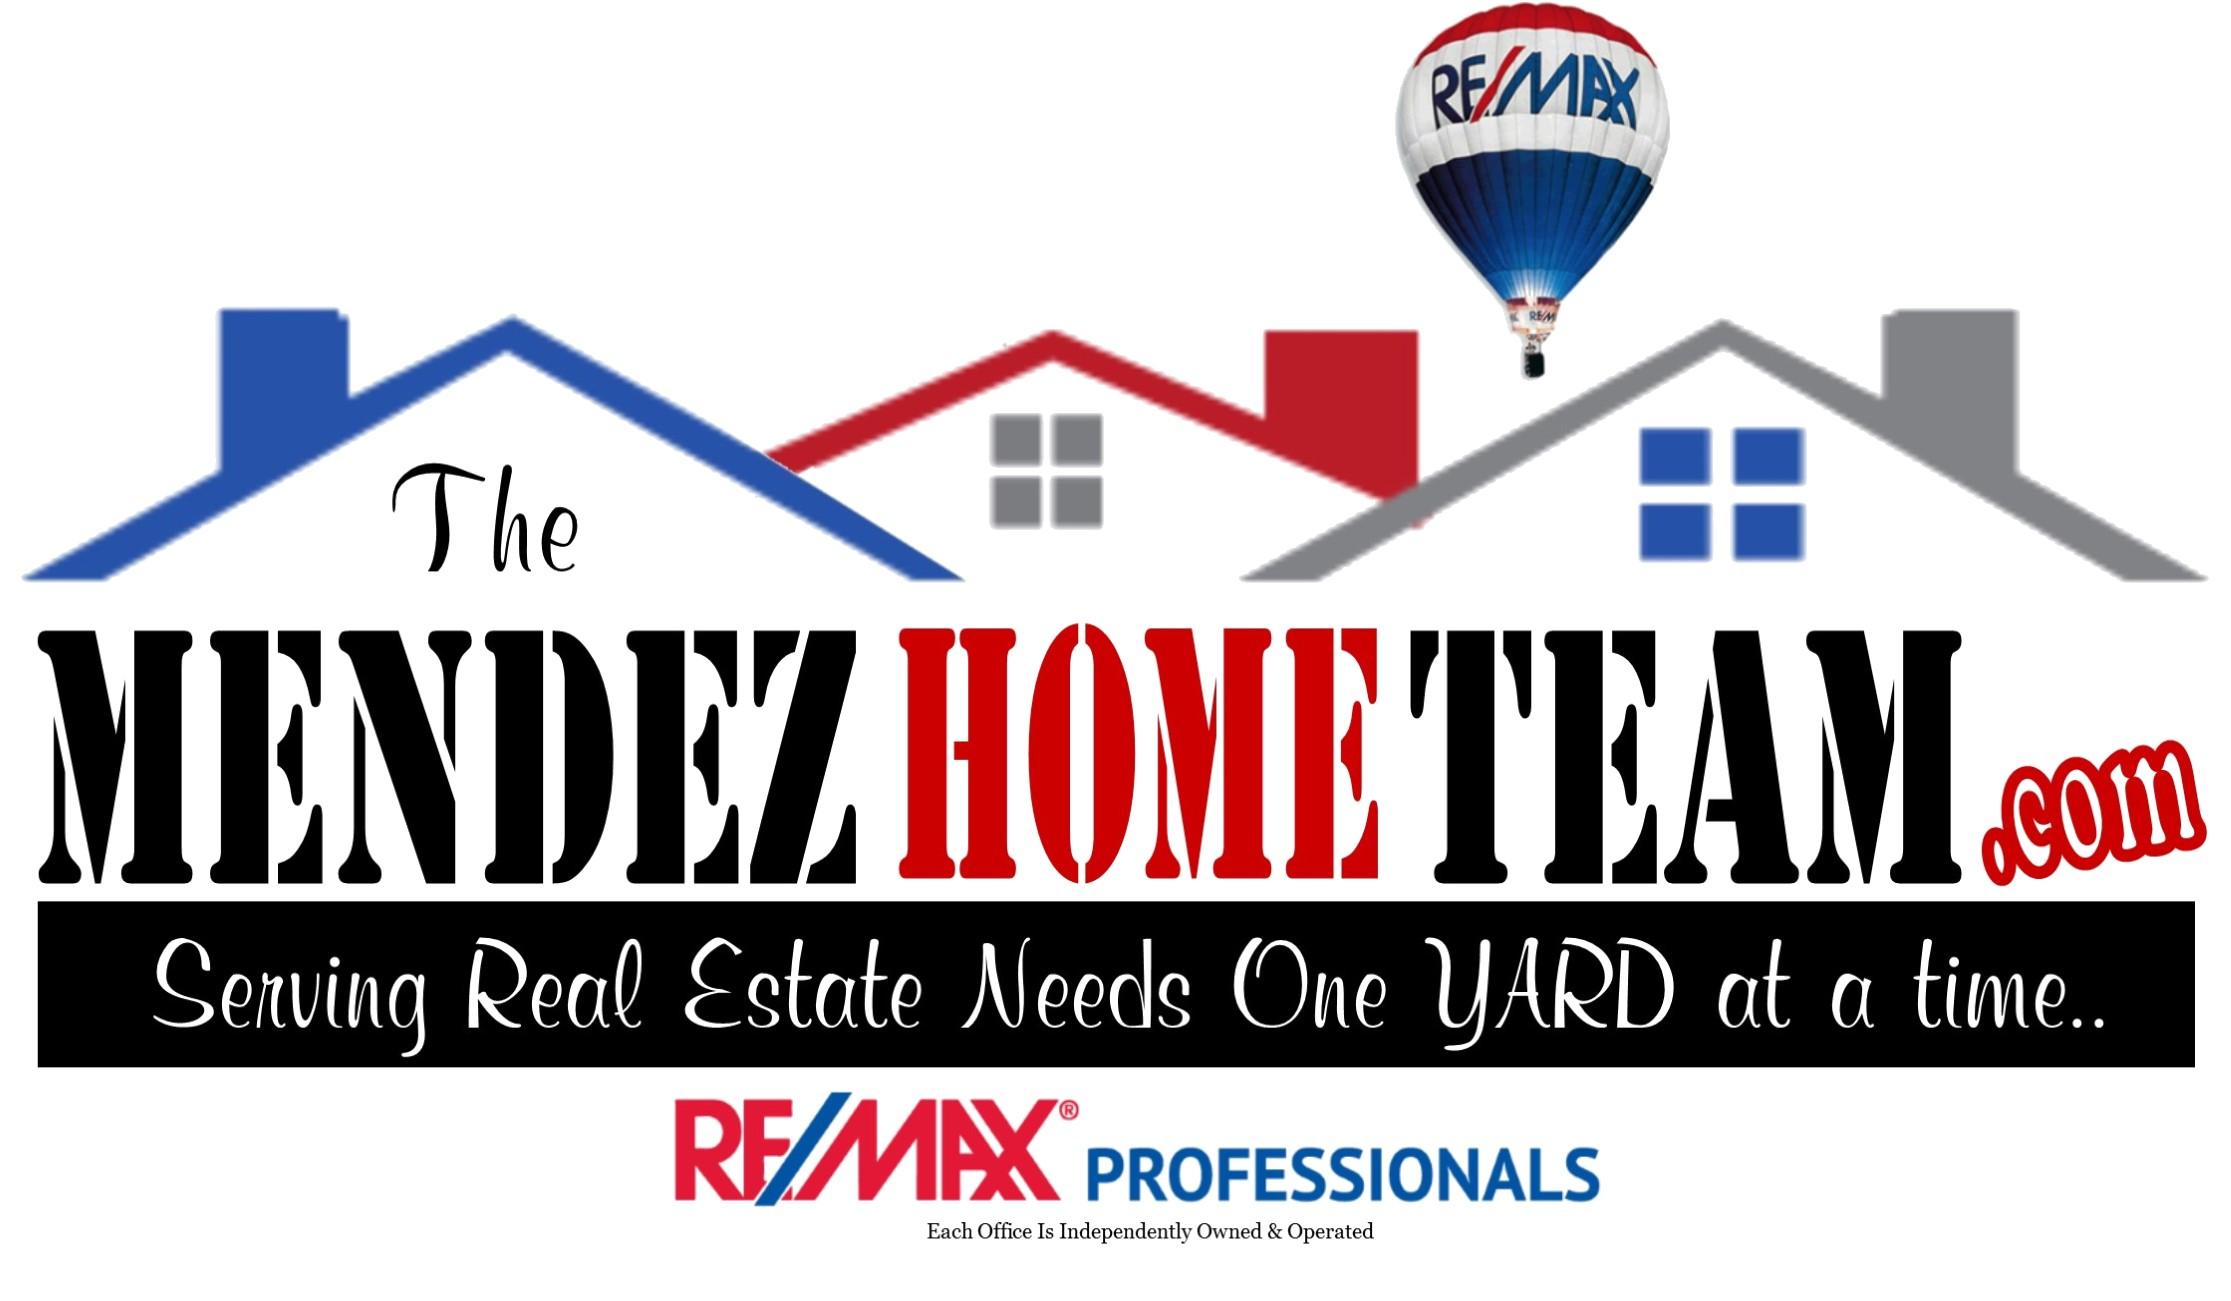 Mendez Home Team